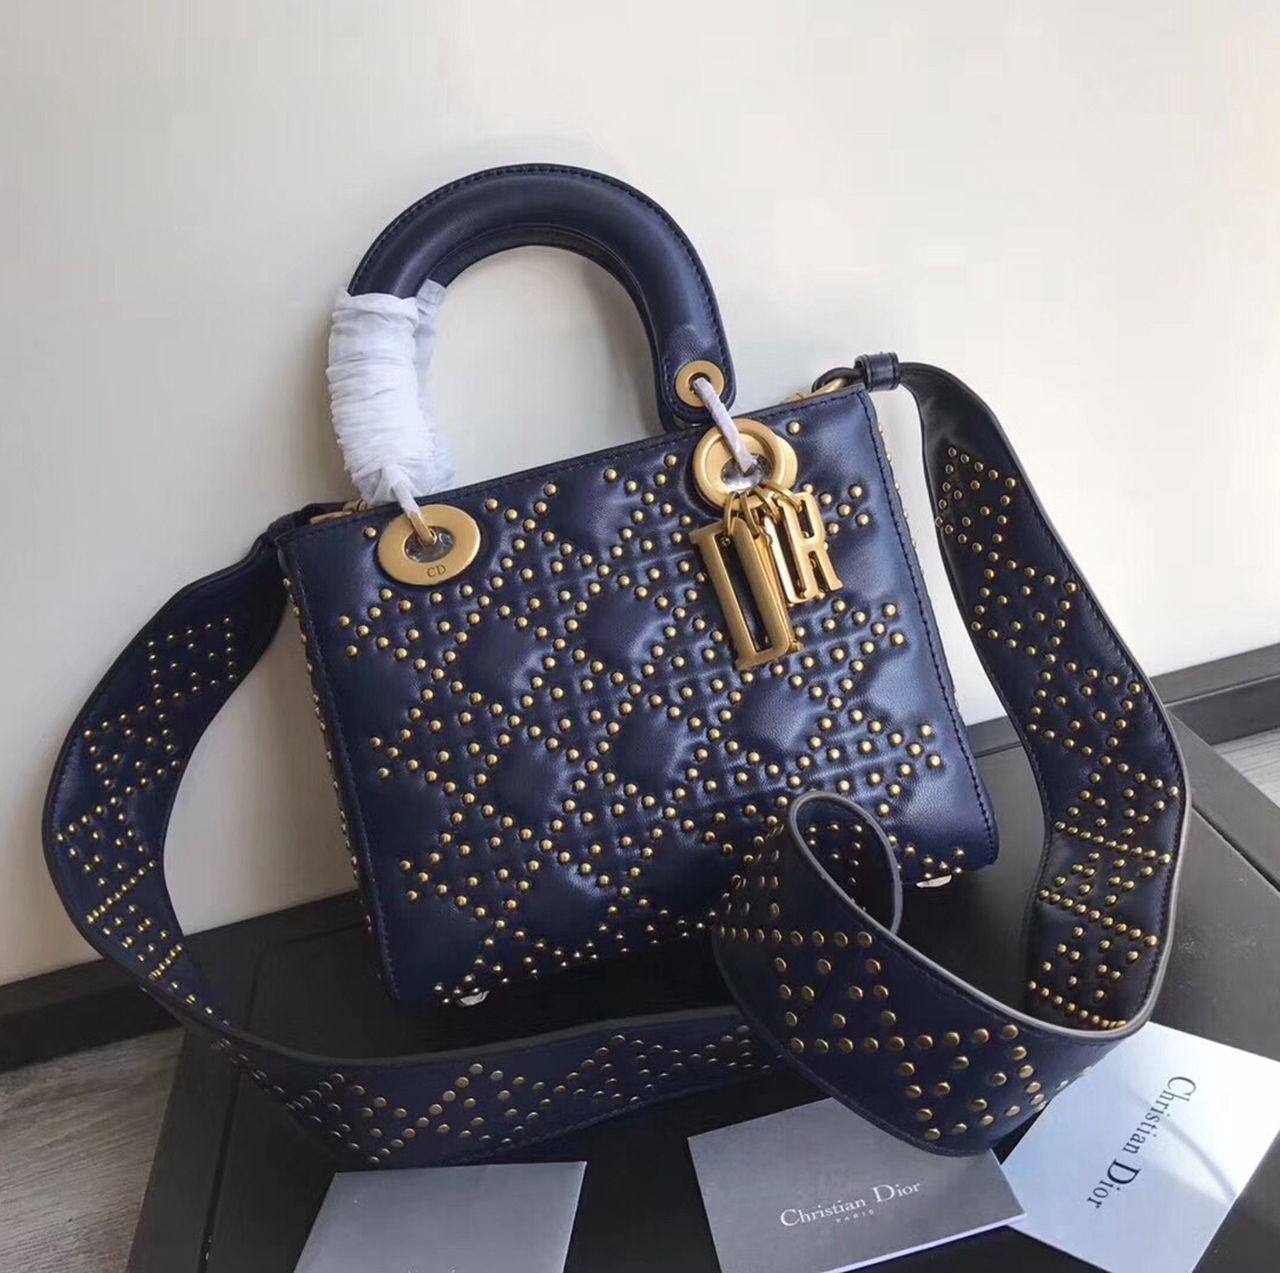 ea72bdfabfa0 Dior Supple Lady Dior Medium Bag in Studded Lambskin Deep Blue 2017 ...